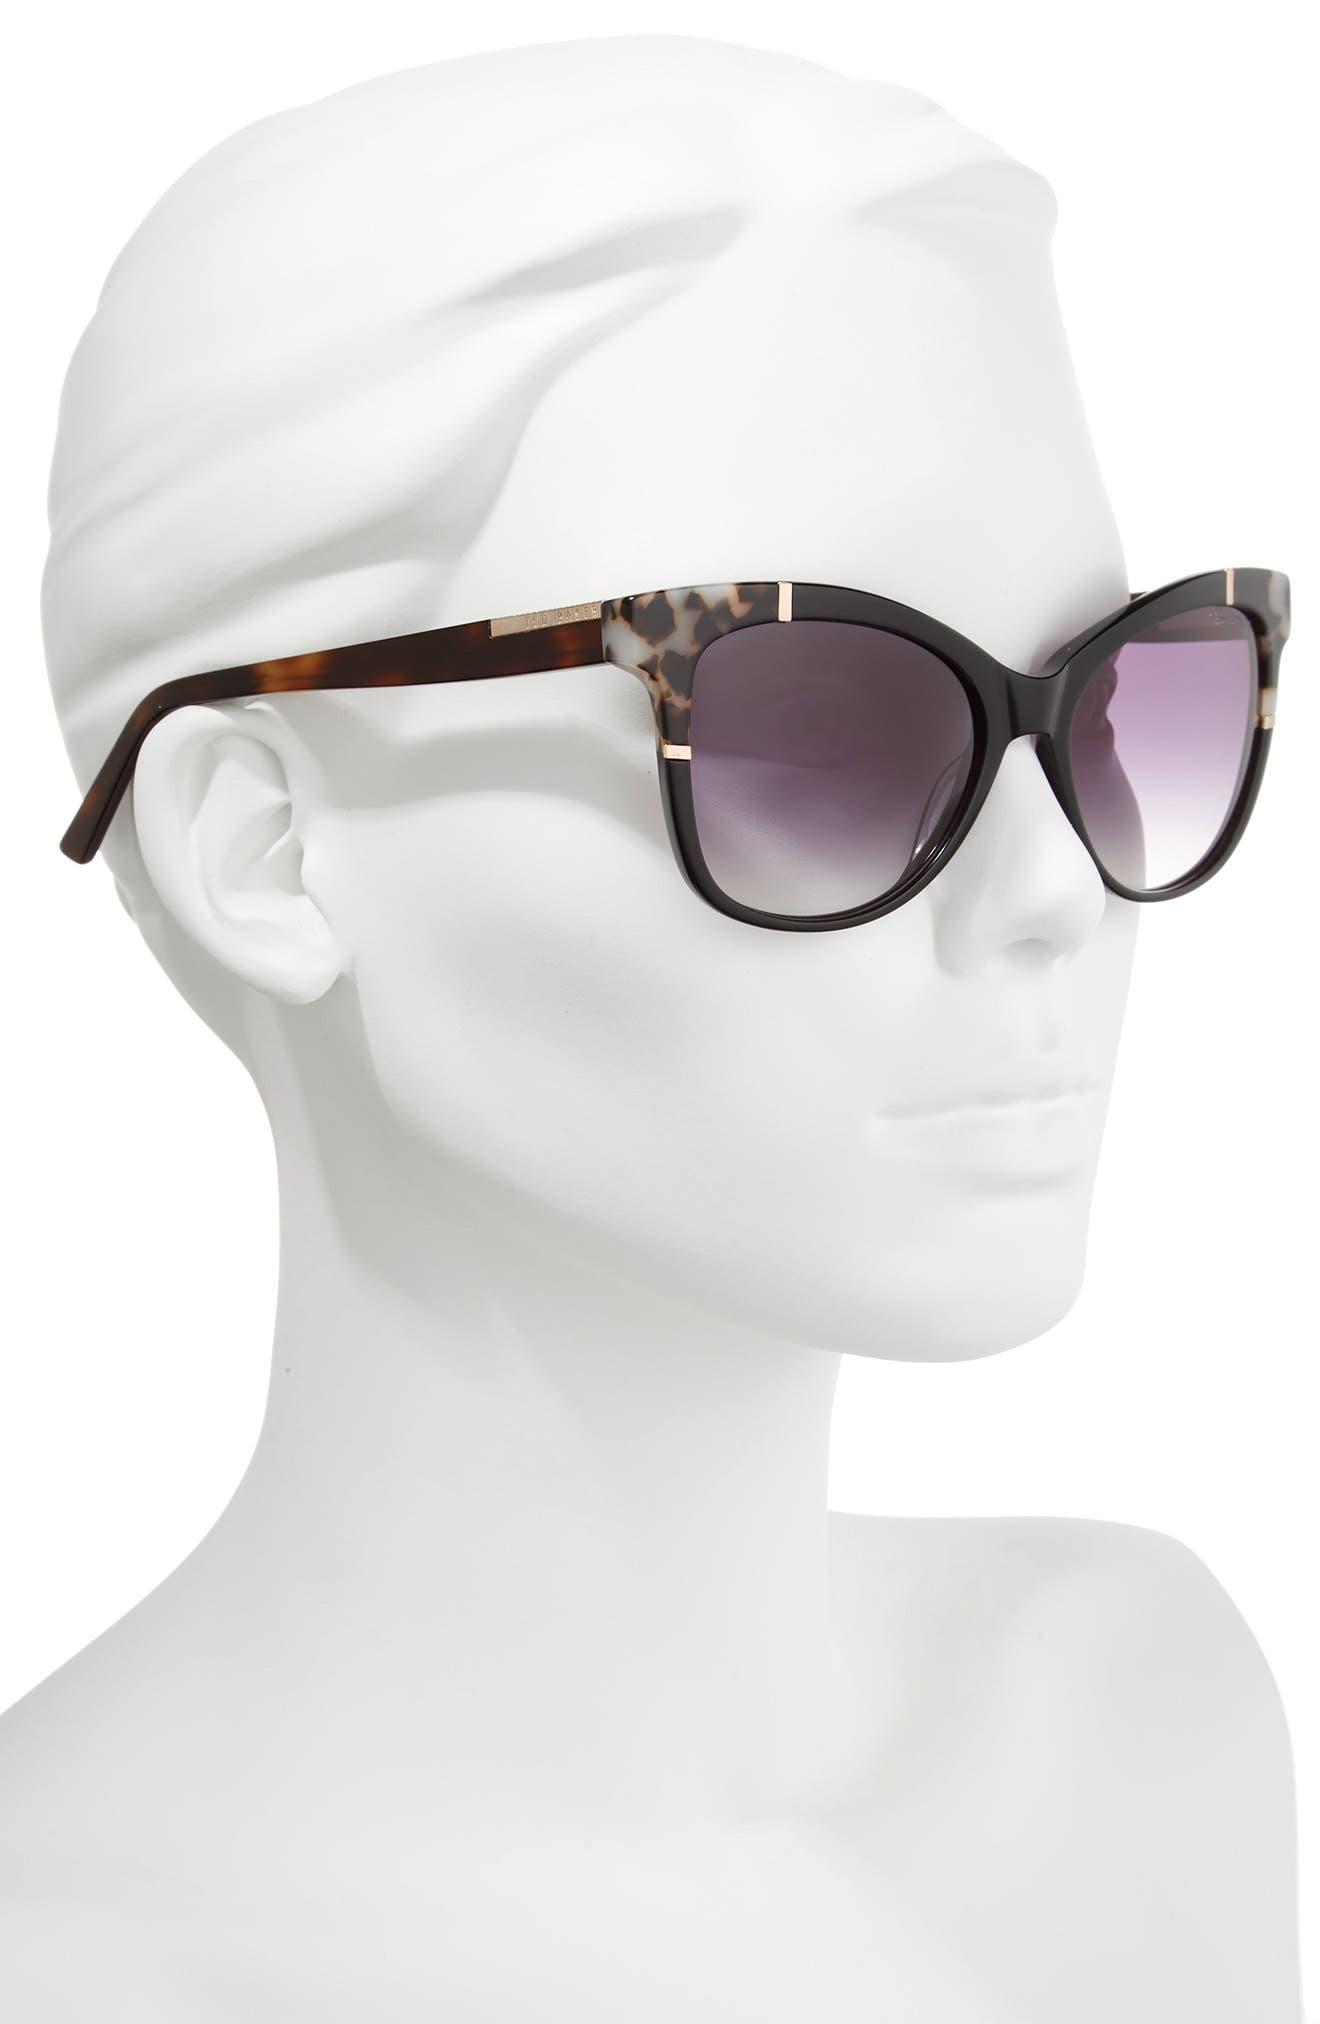 55mm Square Cat Eye Sunglasses,                             Alternate thumbnail 2, color,                             001